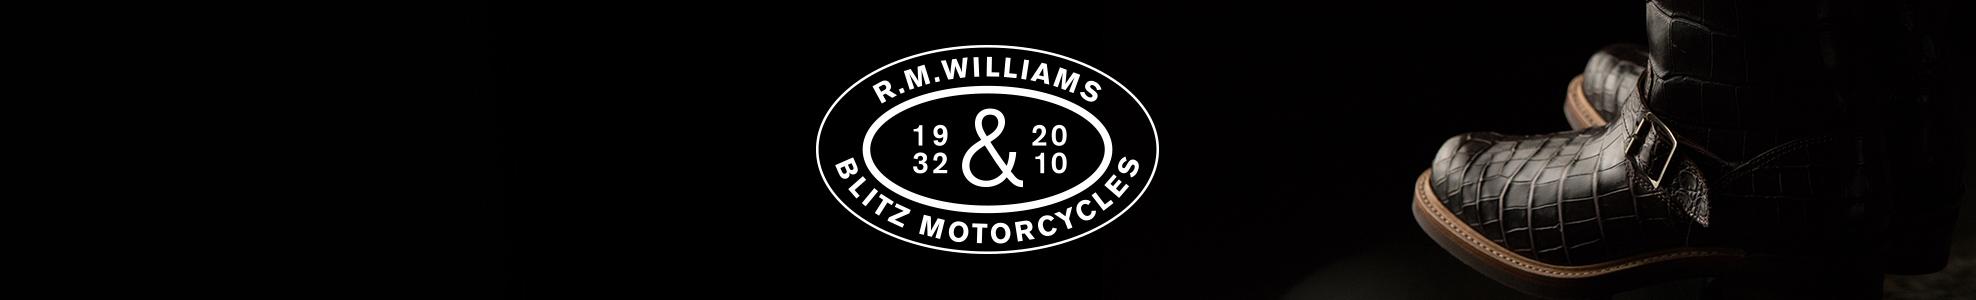 The R.M.Williams x Blitz Bike